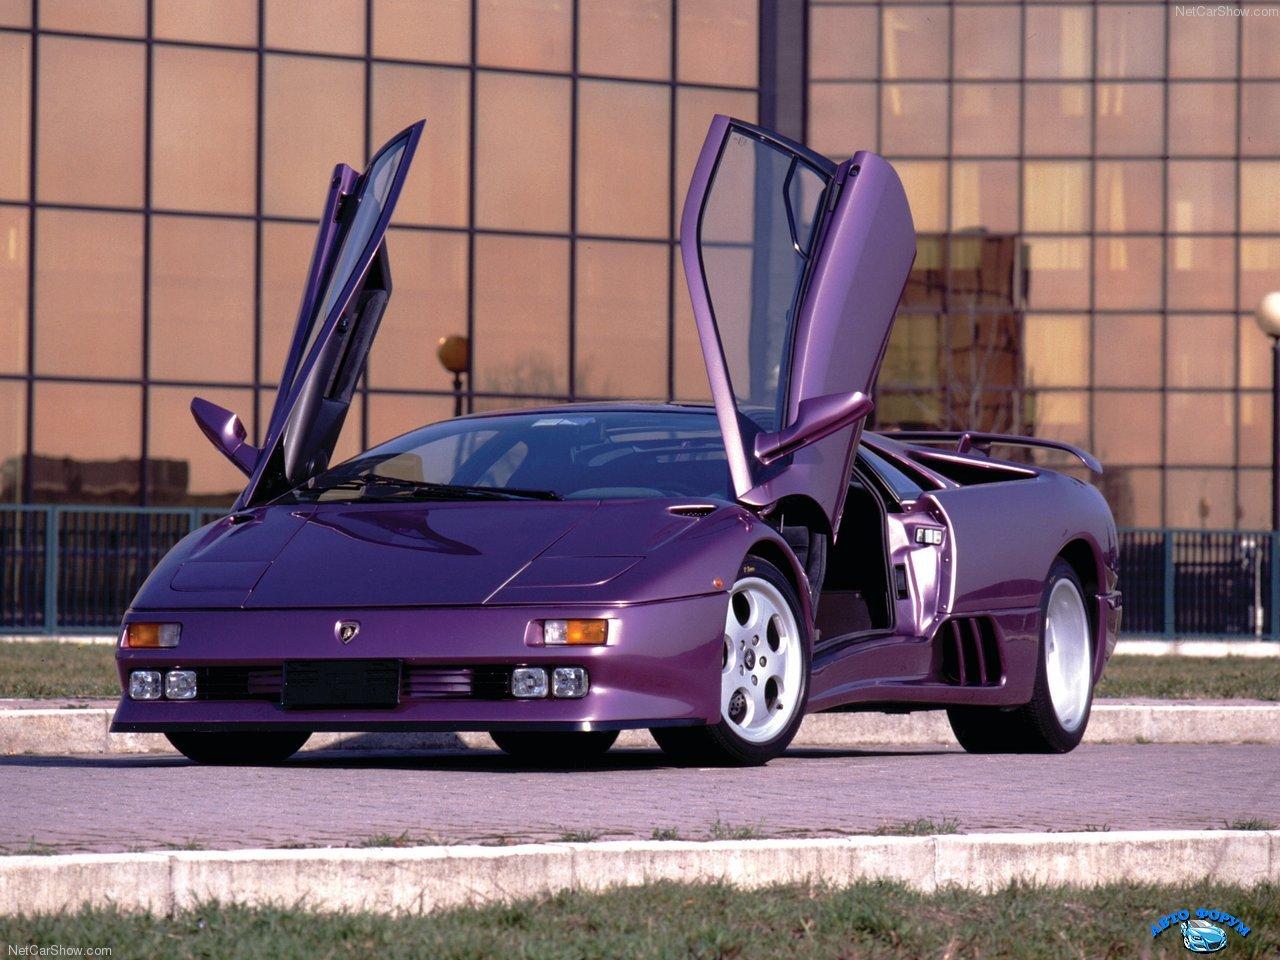 Lamborghini-Diablo_SE_1994_1280x960_wallpaper_01.jpg